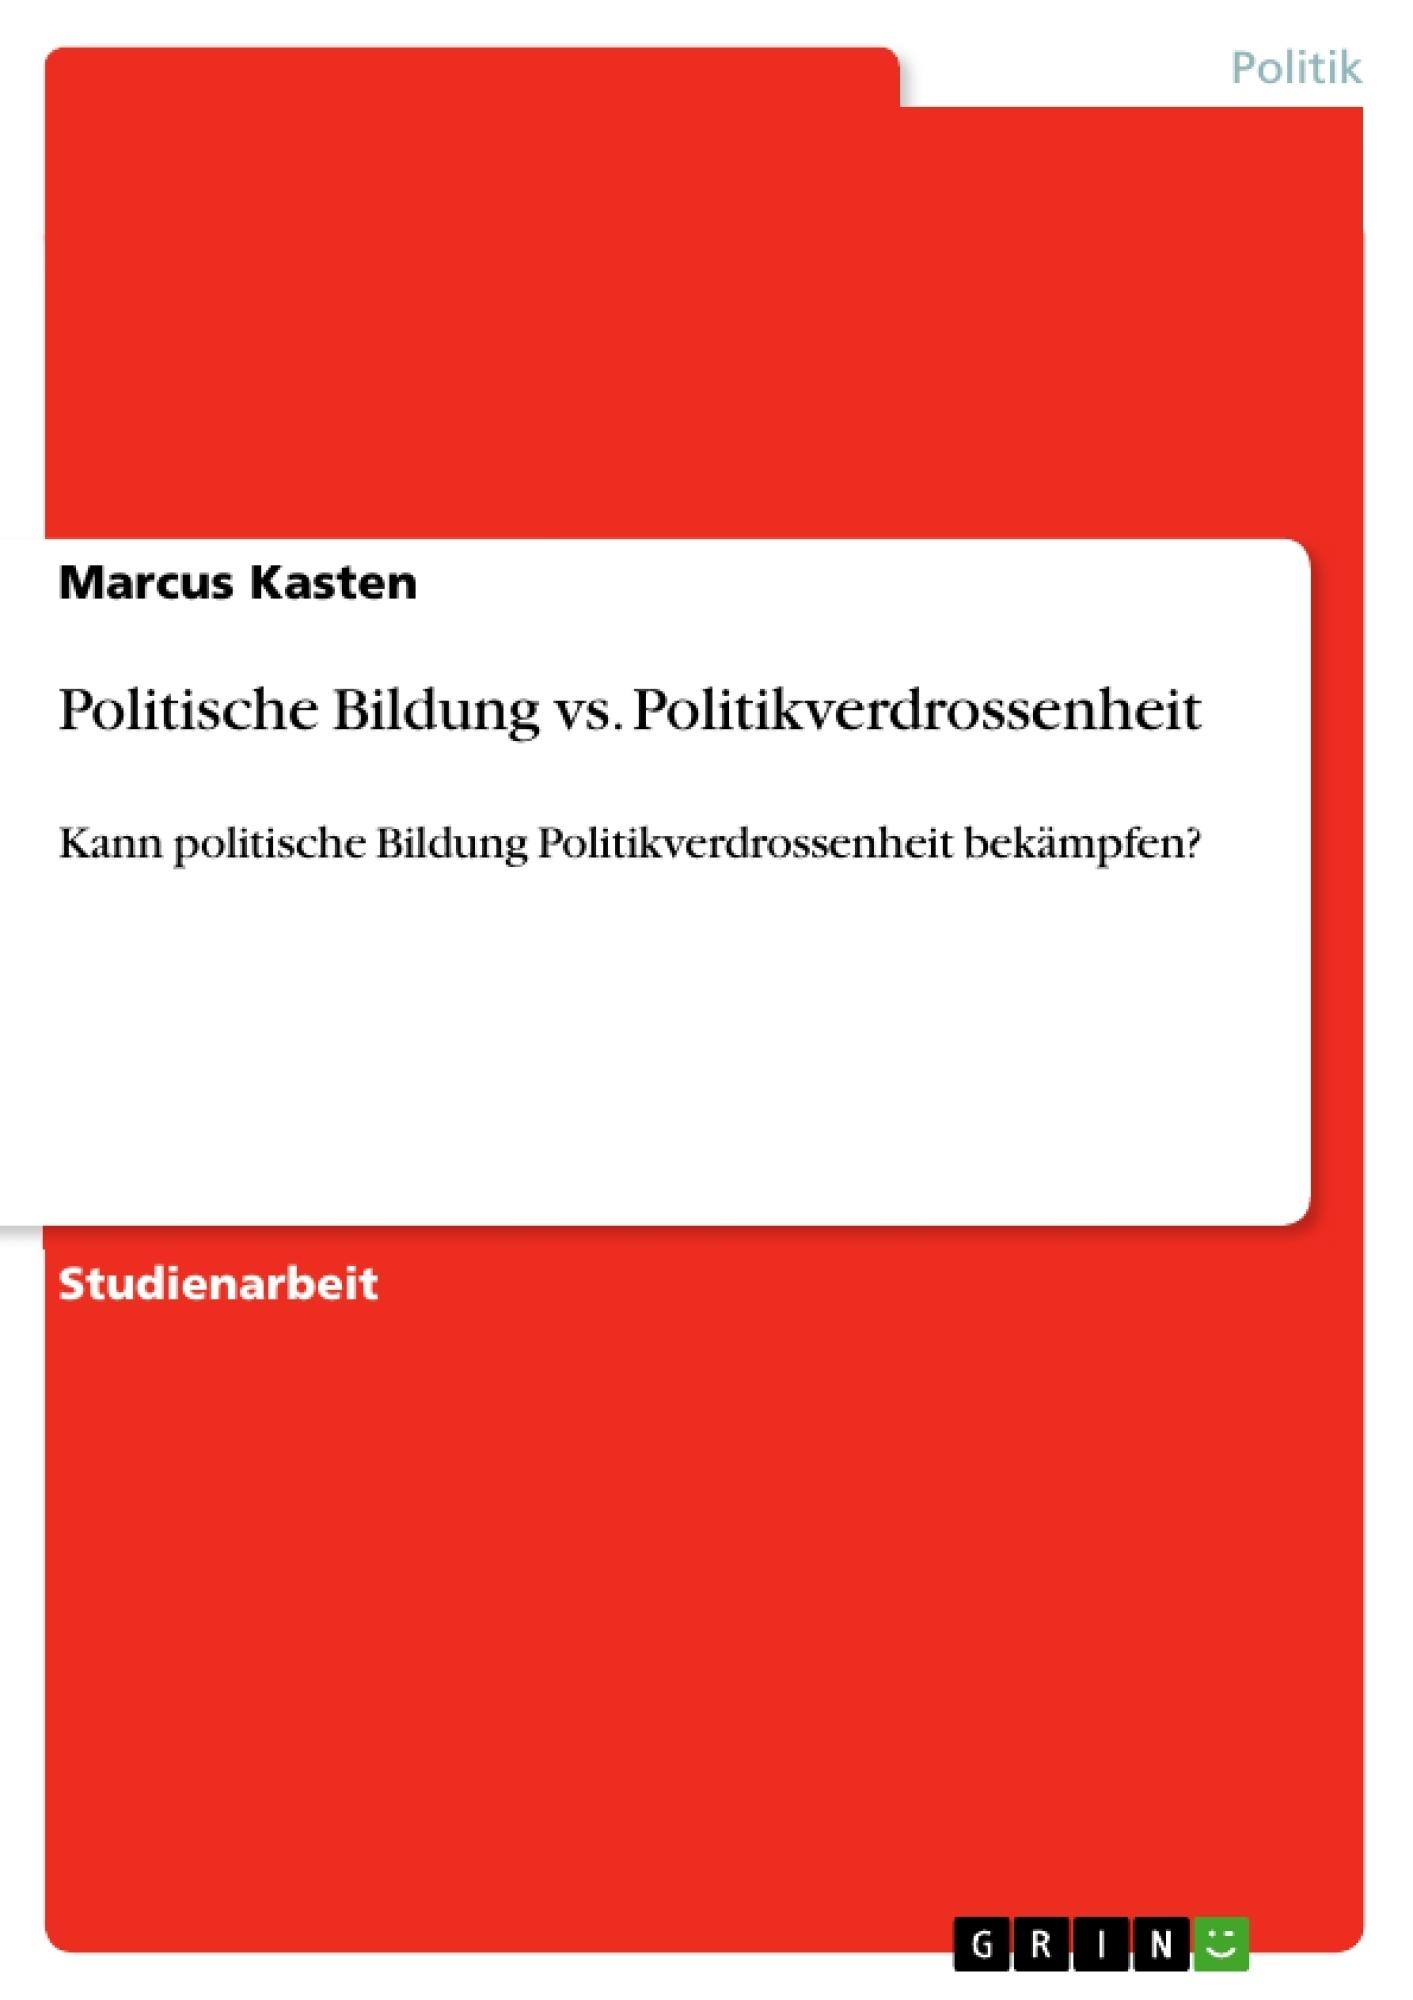 Titel: Politische Bildung vs. Politikverdrossenheit